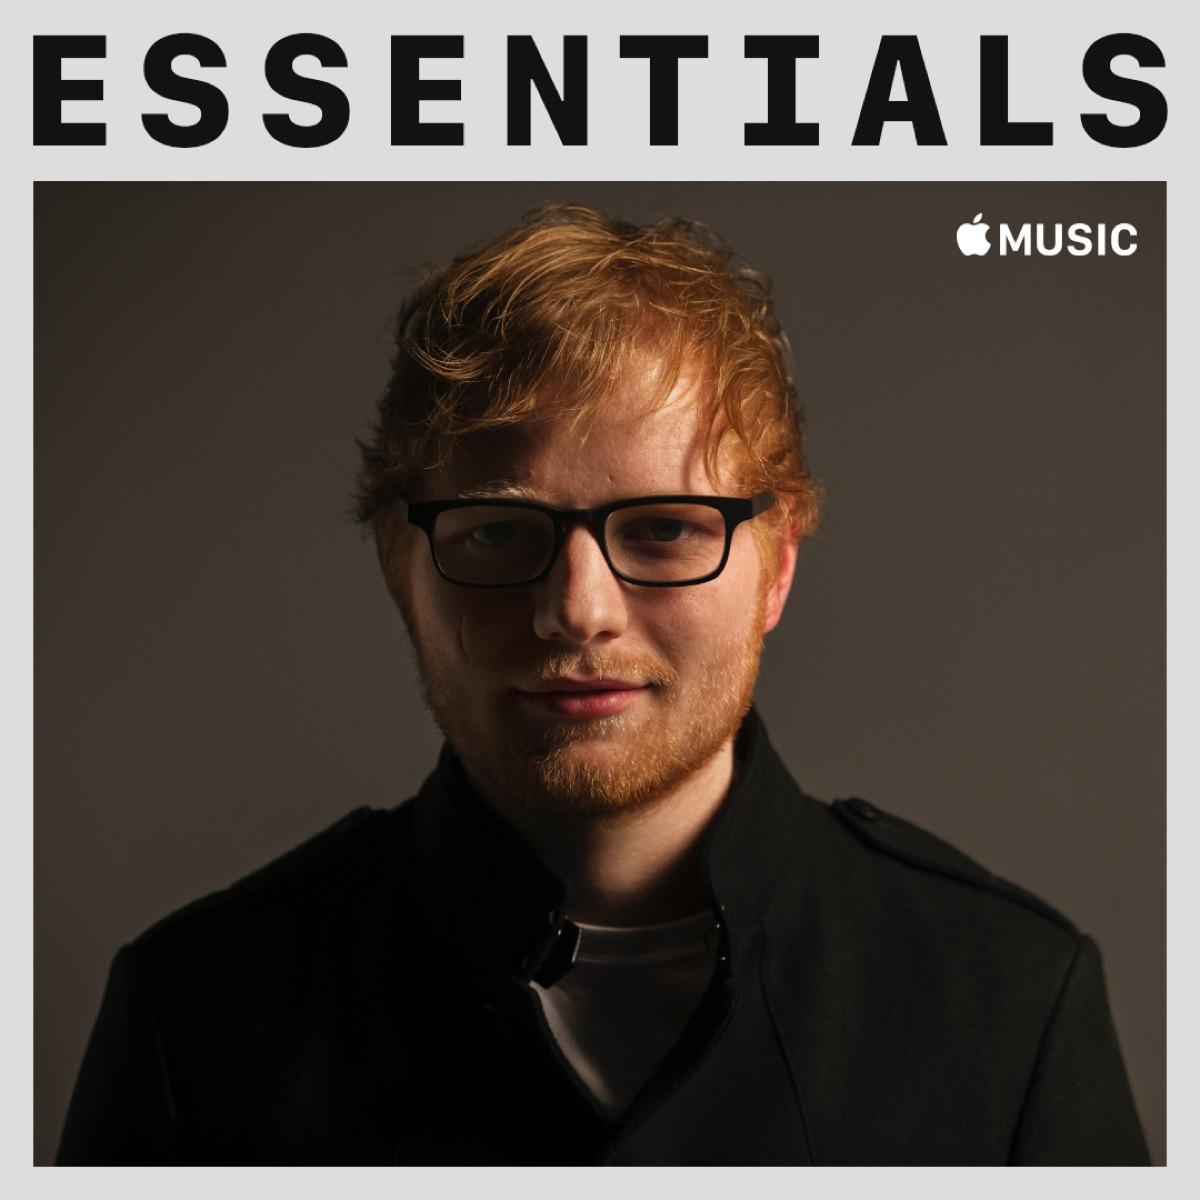 ed sheeran essentials auf apple music. Black Bedroom Furniture Sets. Home Design Ideas